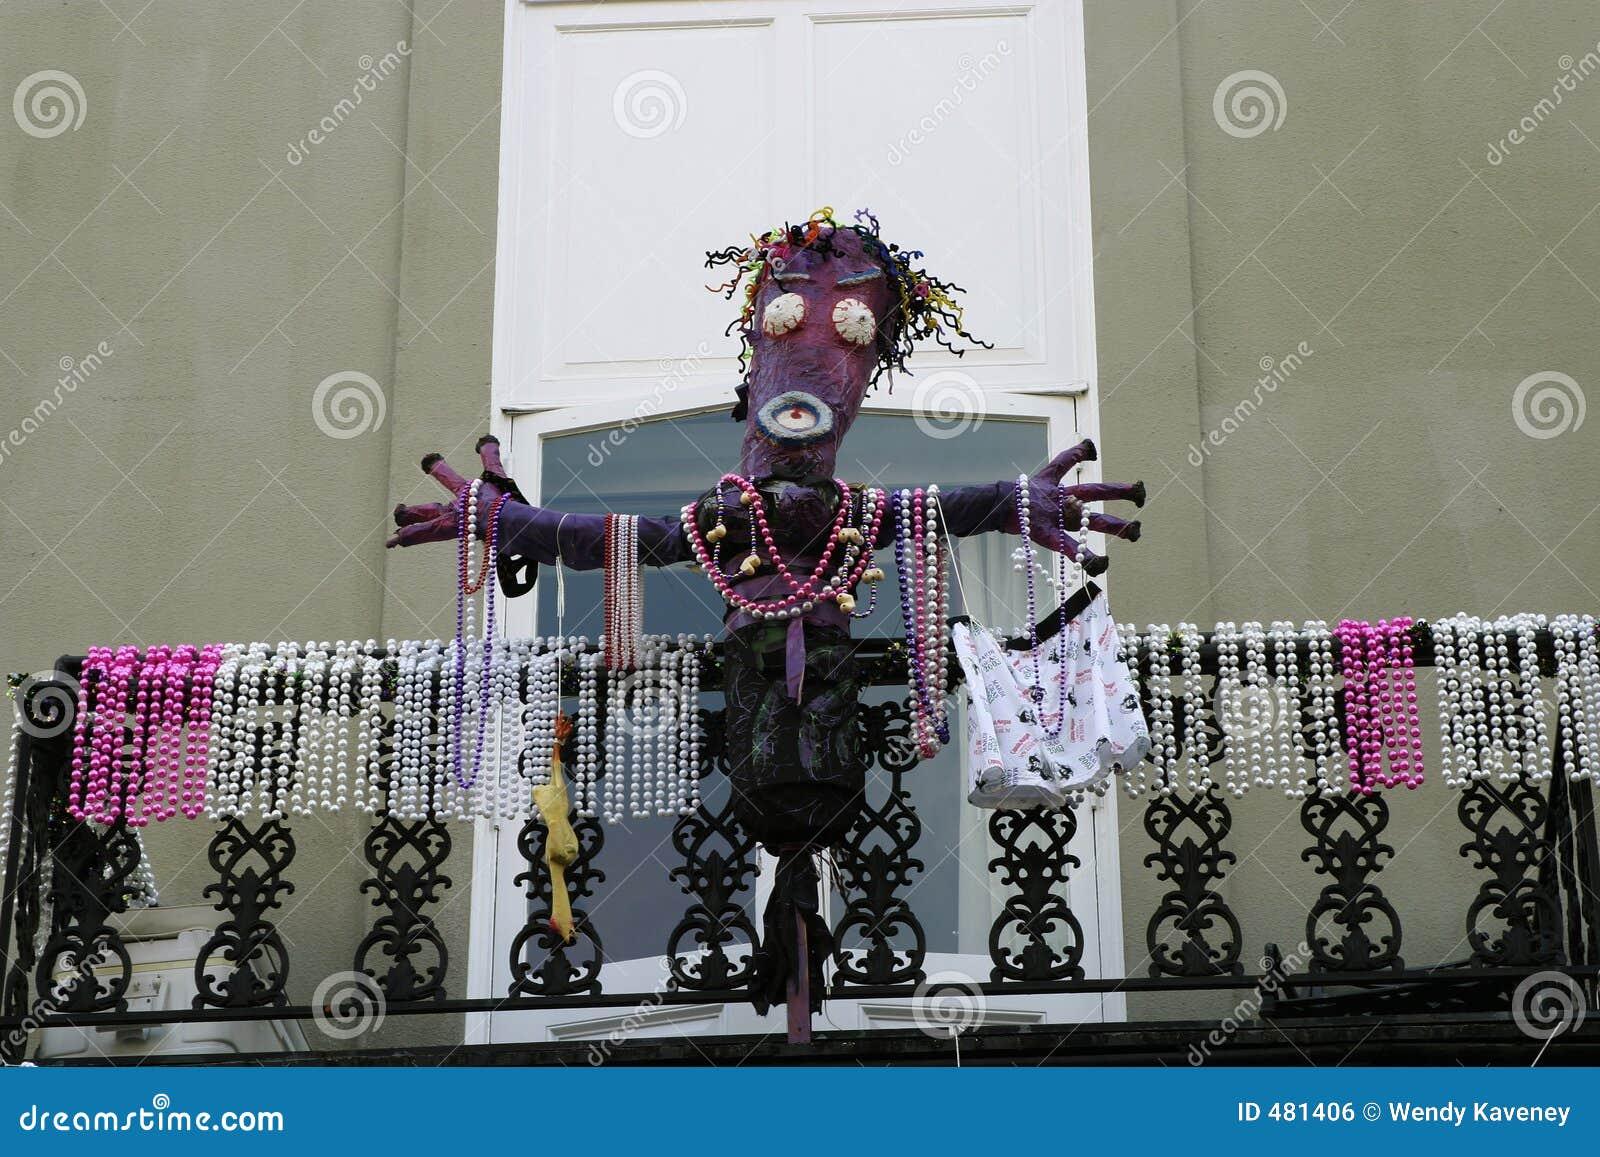 Voodoo amulet royalty free stock photos image 2718528 - Voodoo Doll And Beads Royalty Free Stock Image